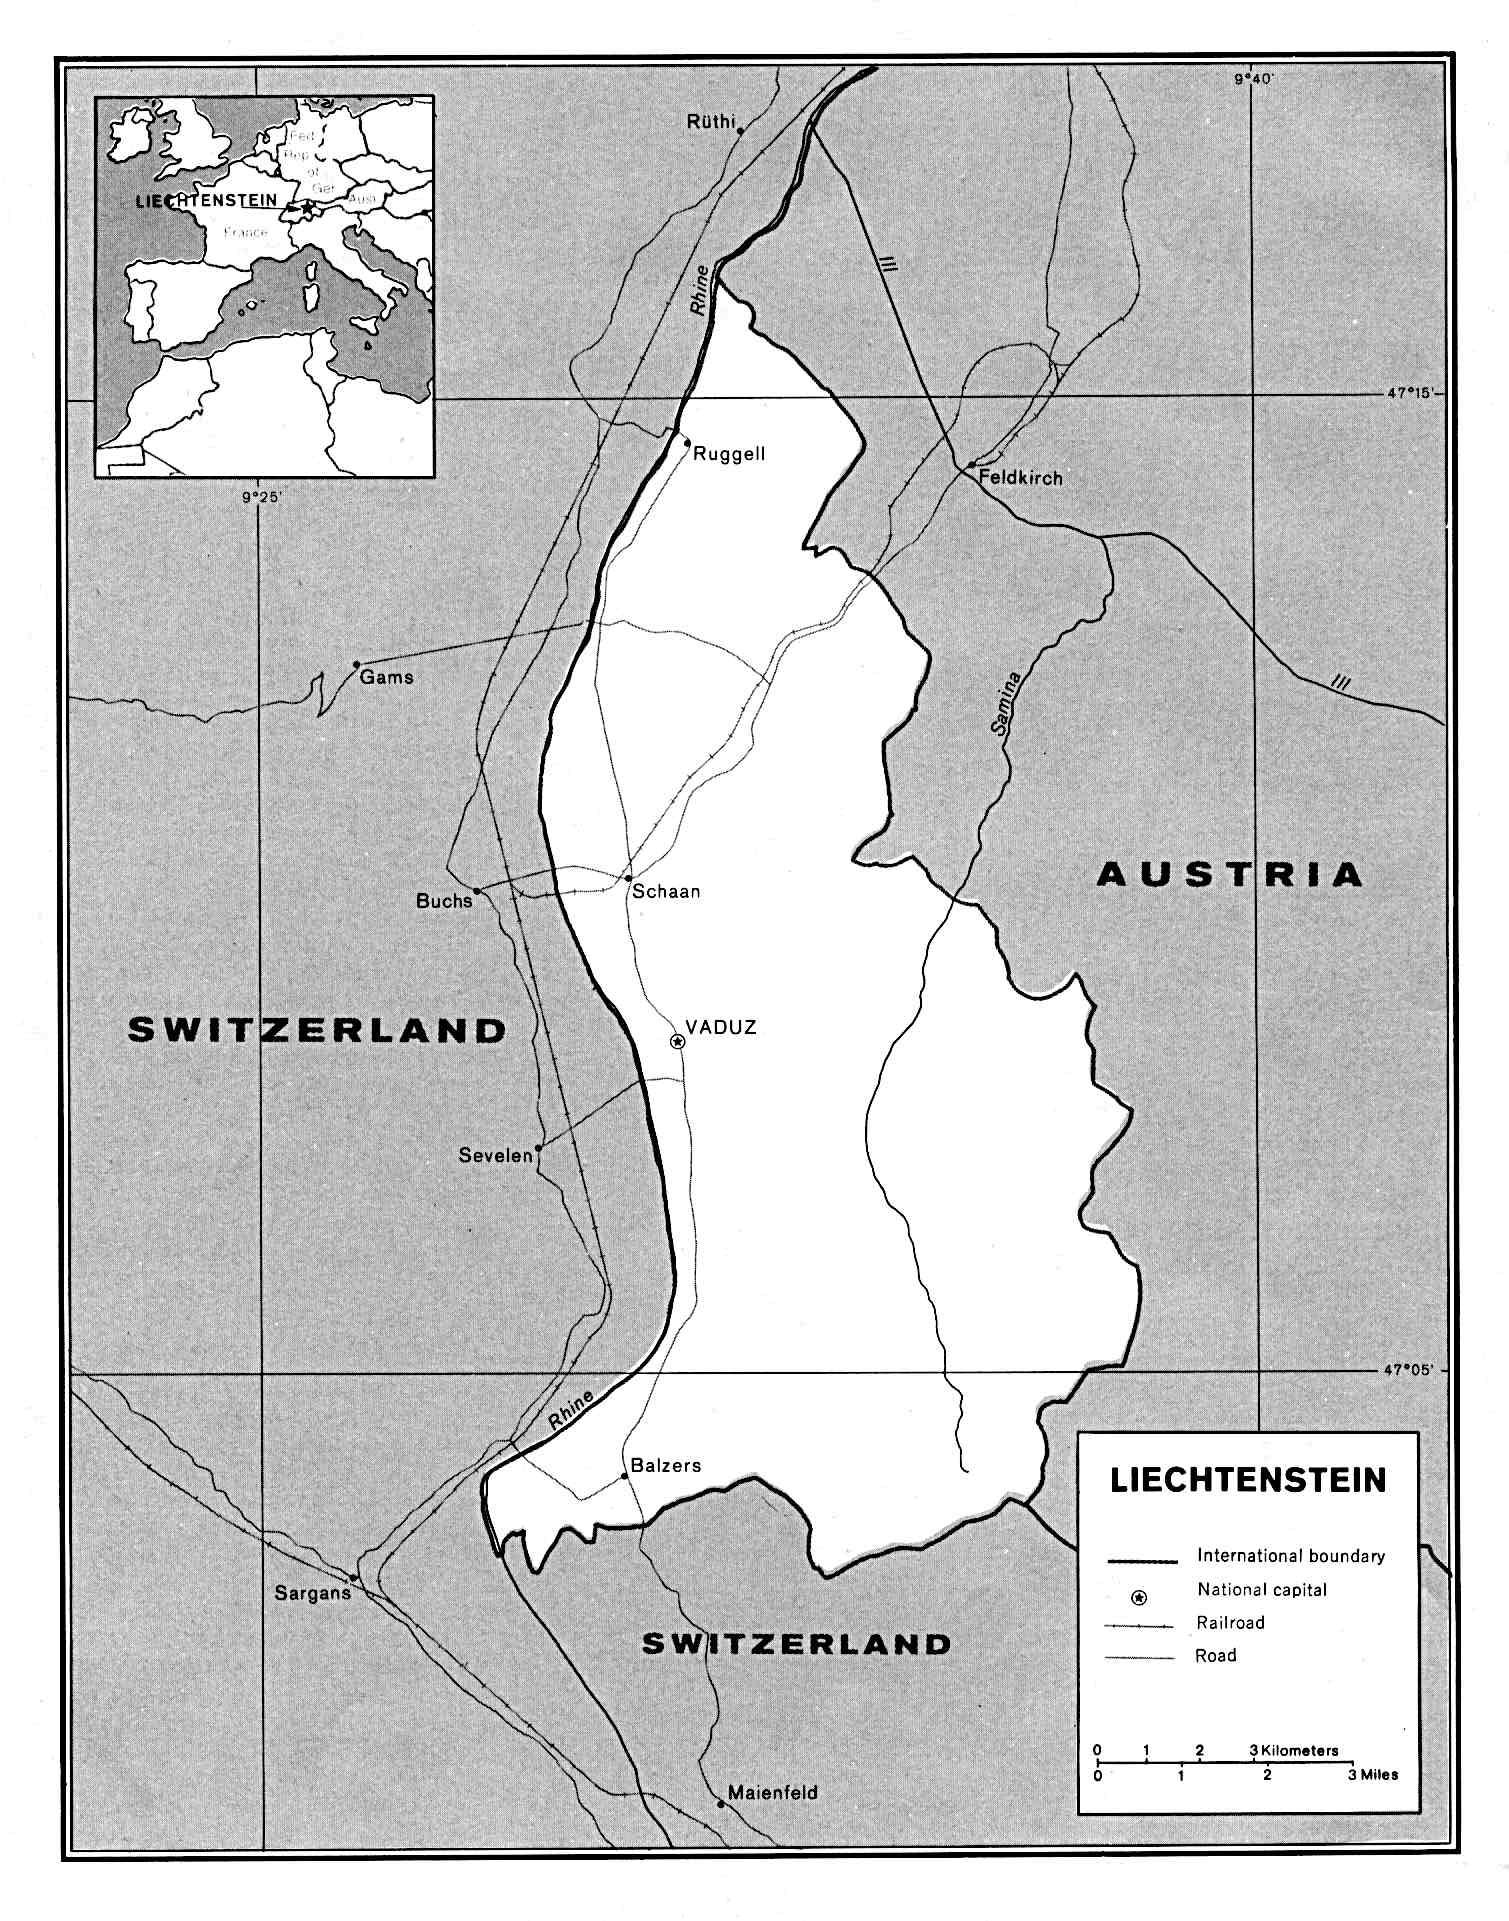 Maps Of Liechtenstein Detailed Map Of Liechtenstein In English - Liechtenstein maps with countries